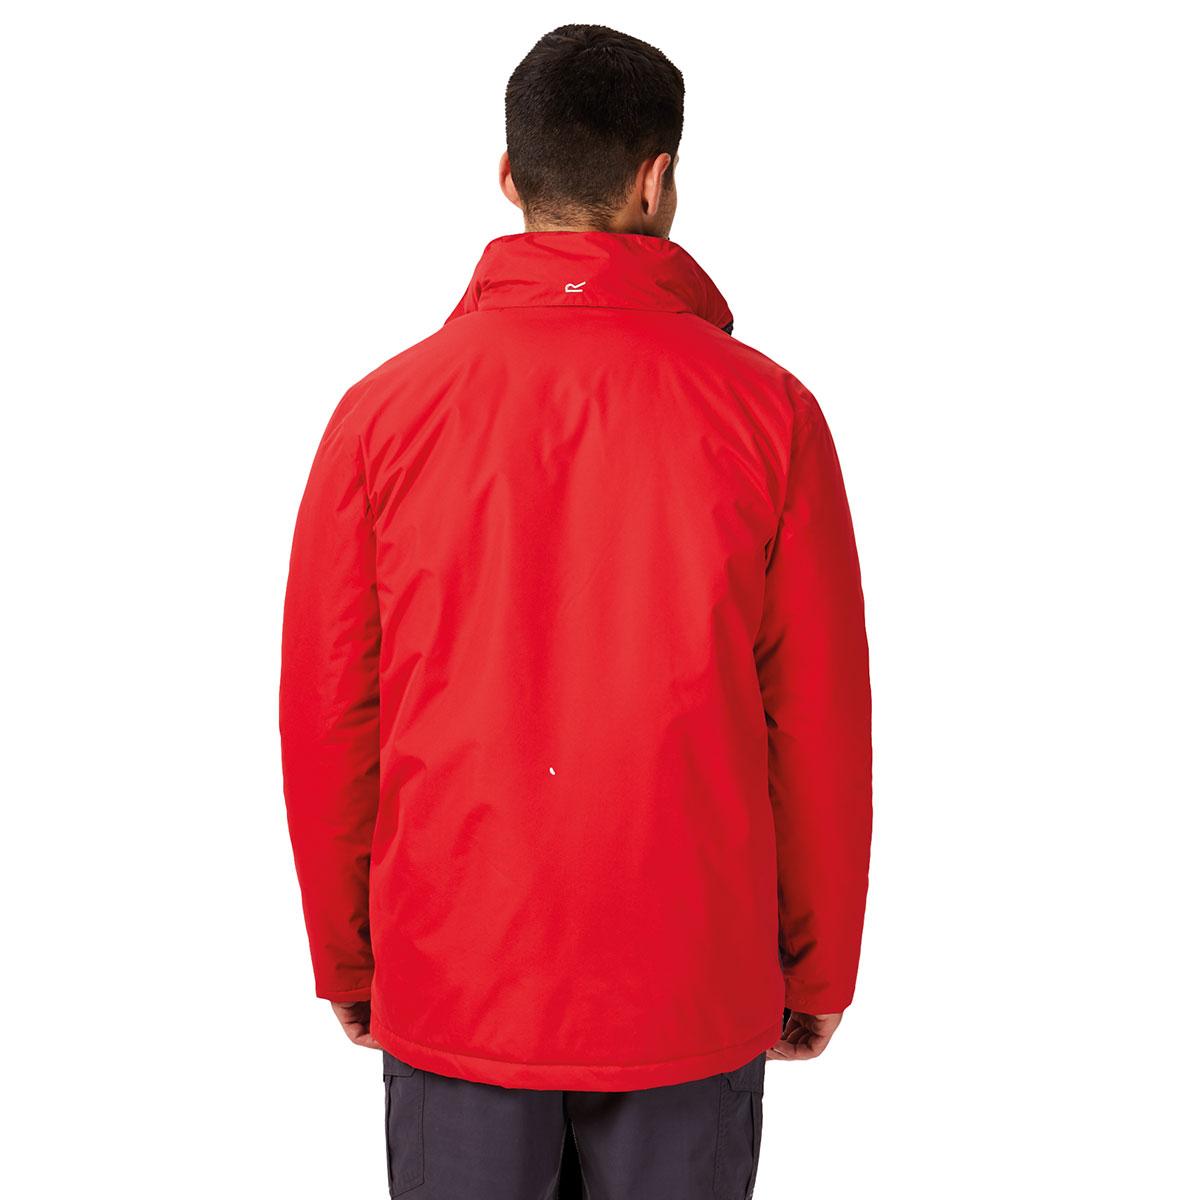 Regatta-Mens-Thornridge-Thermal-Waterproof-Jacket-69-OFF-RRP thumbnail 11